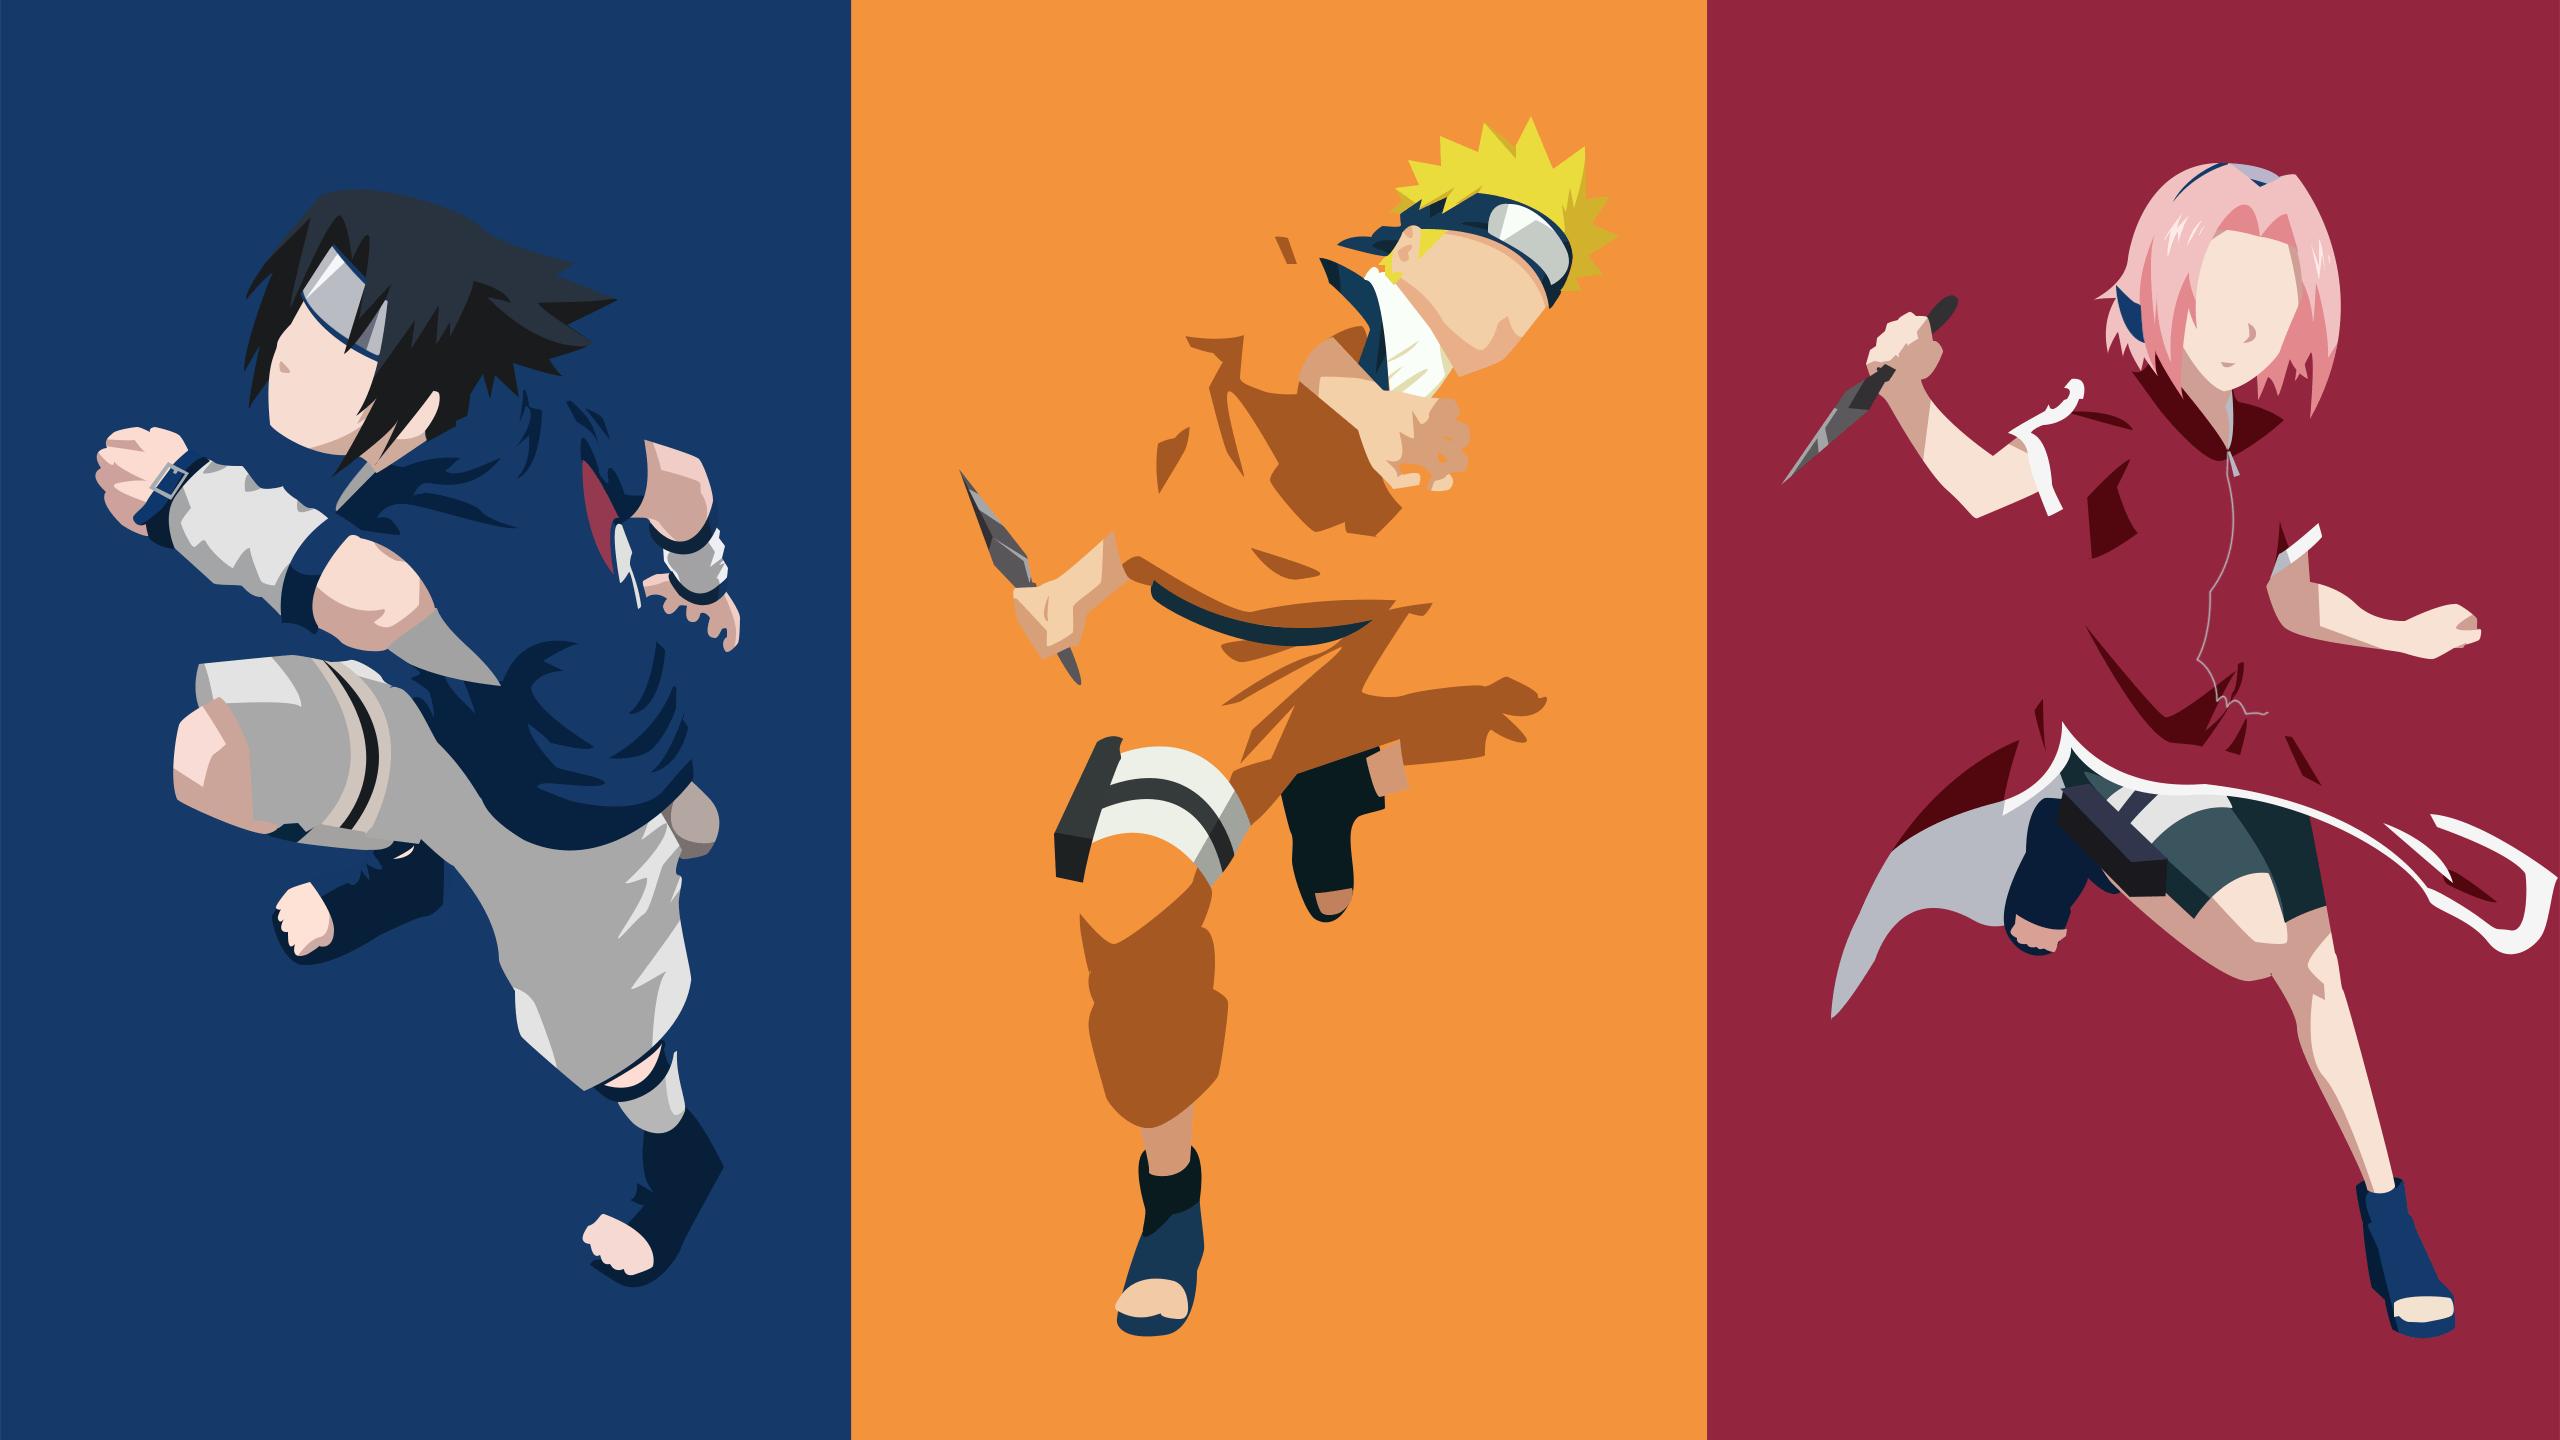 Unduh 830 Koleksi Wallpaper Naruto Child HD Gratid